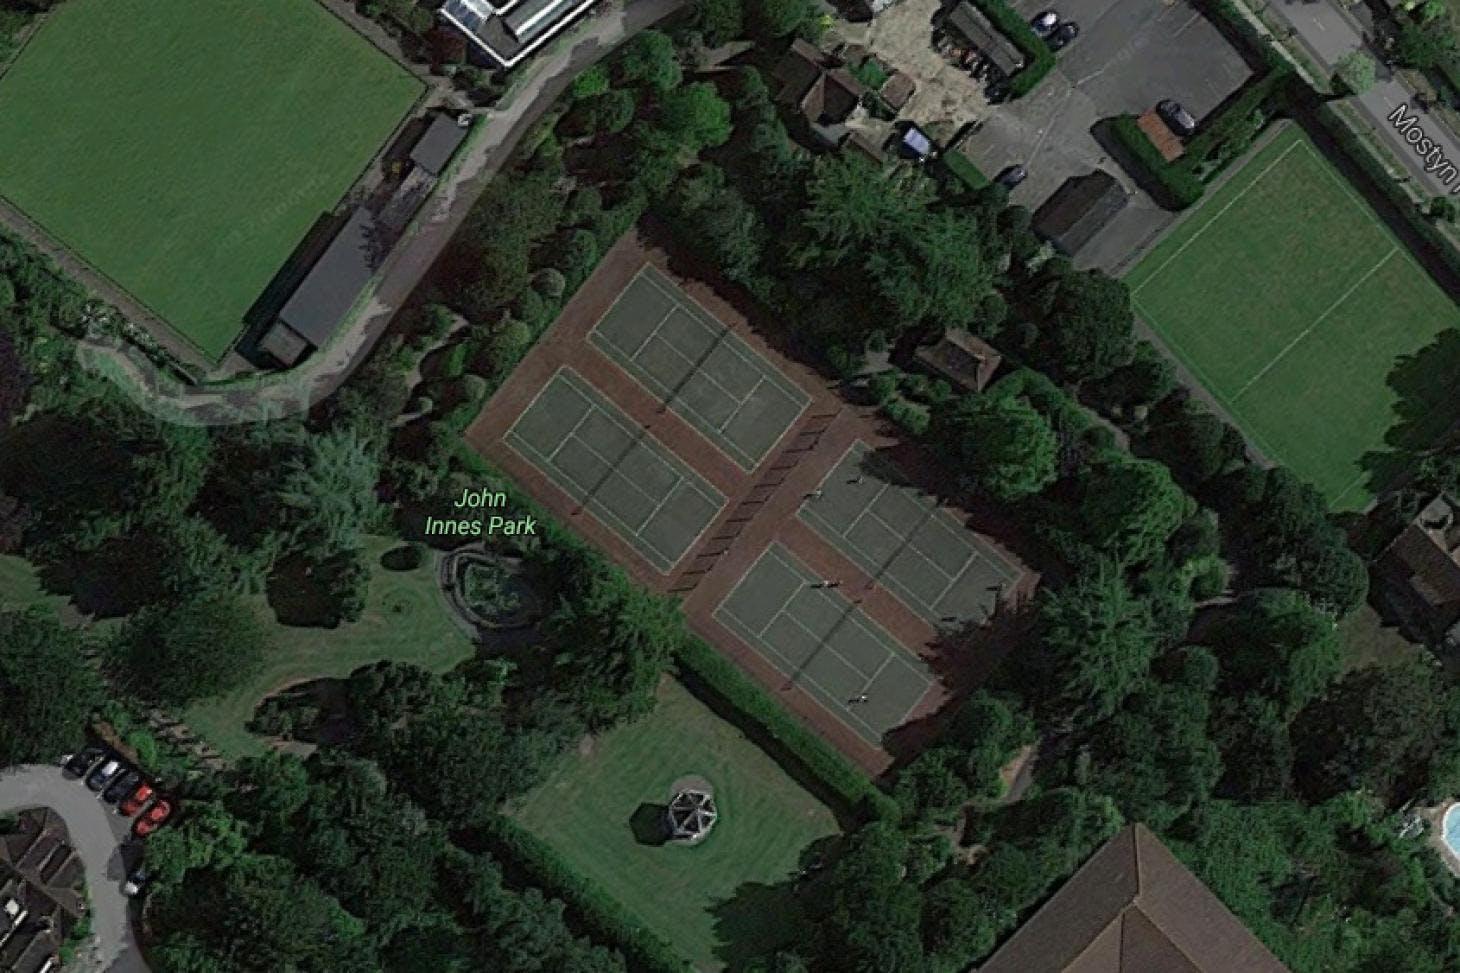 John Innes Park Outdoor | Hard (macadam) tennis court